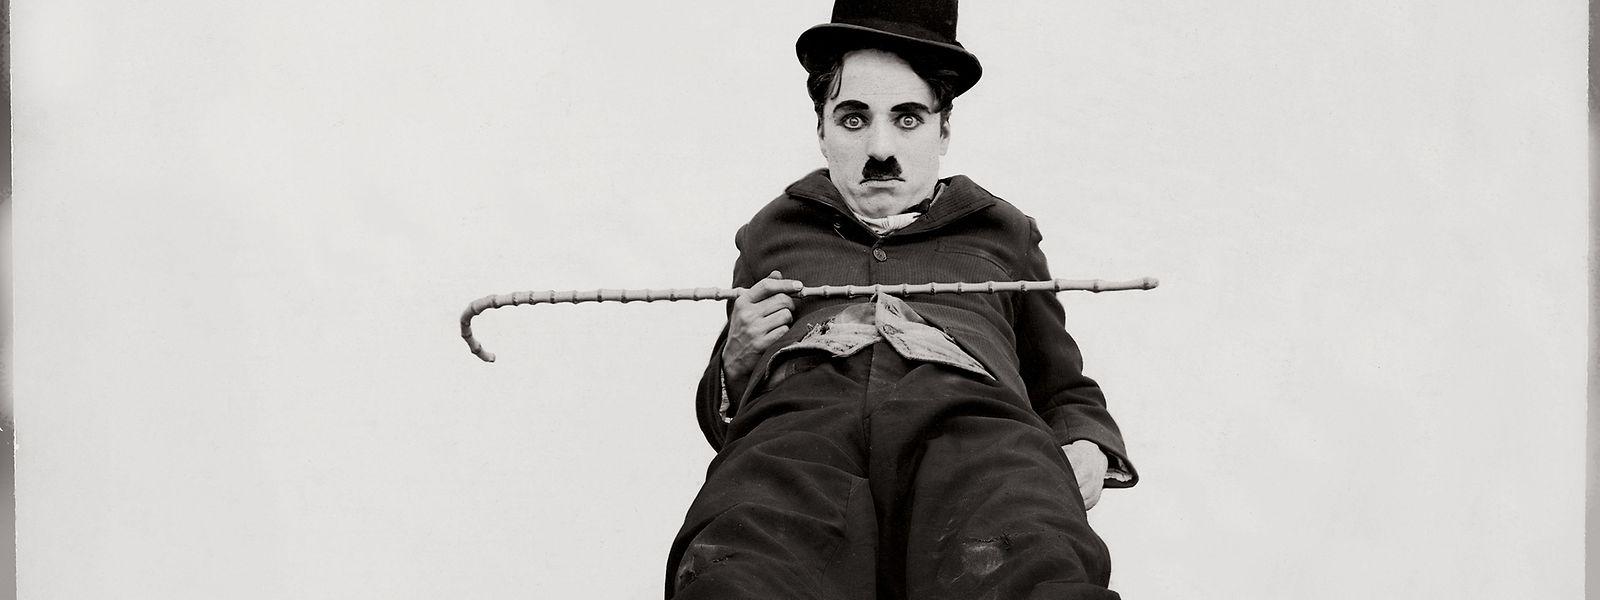 Ikonisch: Charlie Chaplin in seiner berühmten Rolle.